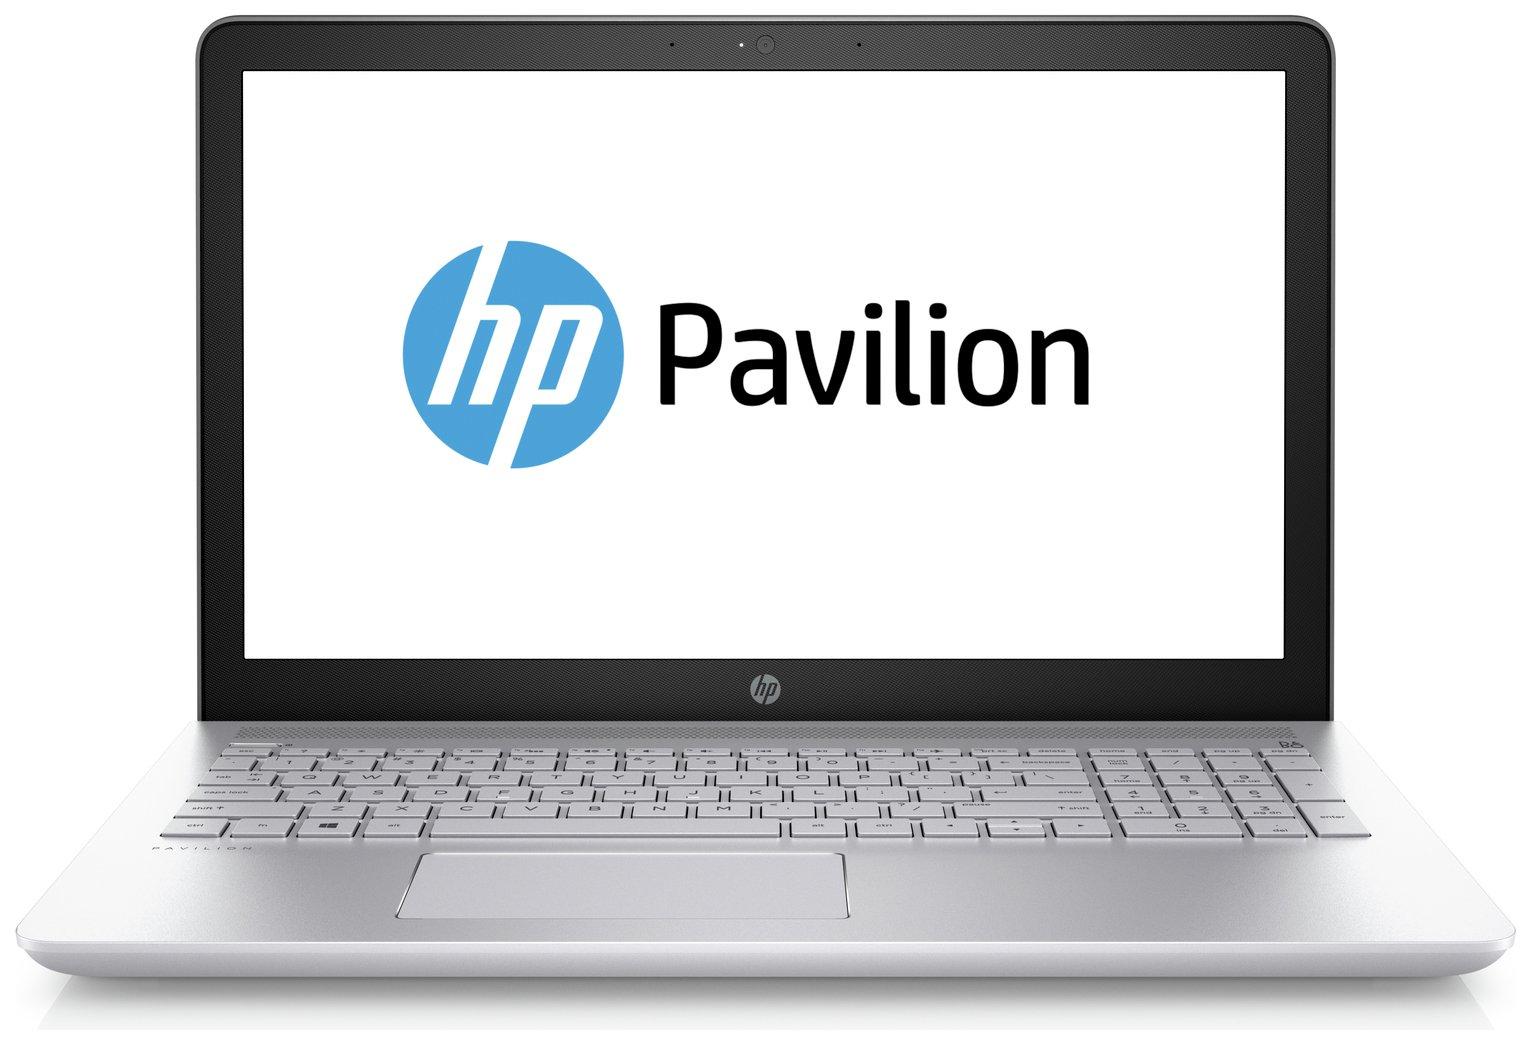 HP Pavilion 15.6 Inch Intel i3 8GB 1TB Laptop